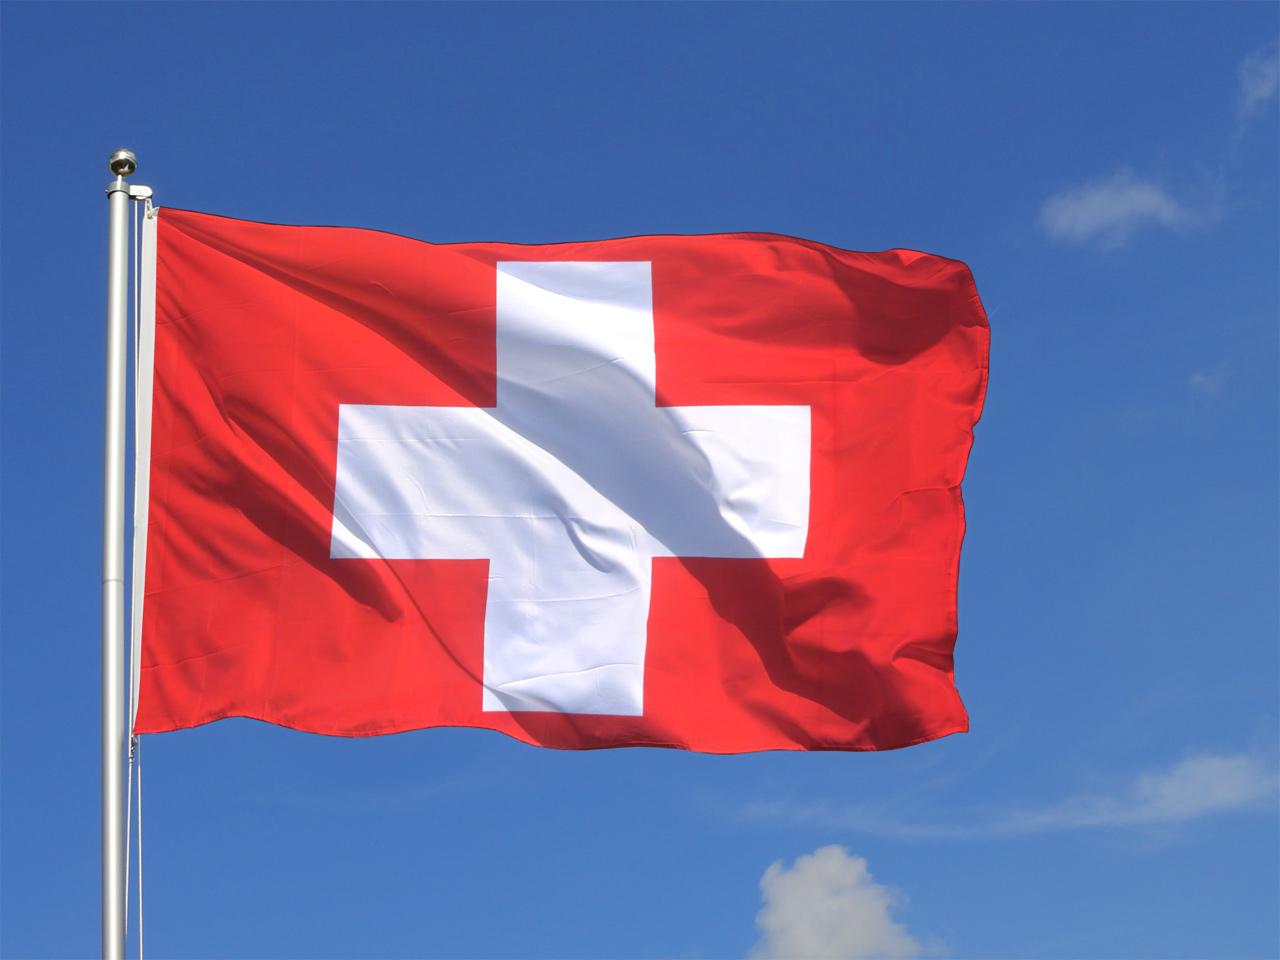 schweiz weissrussland